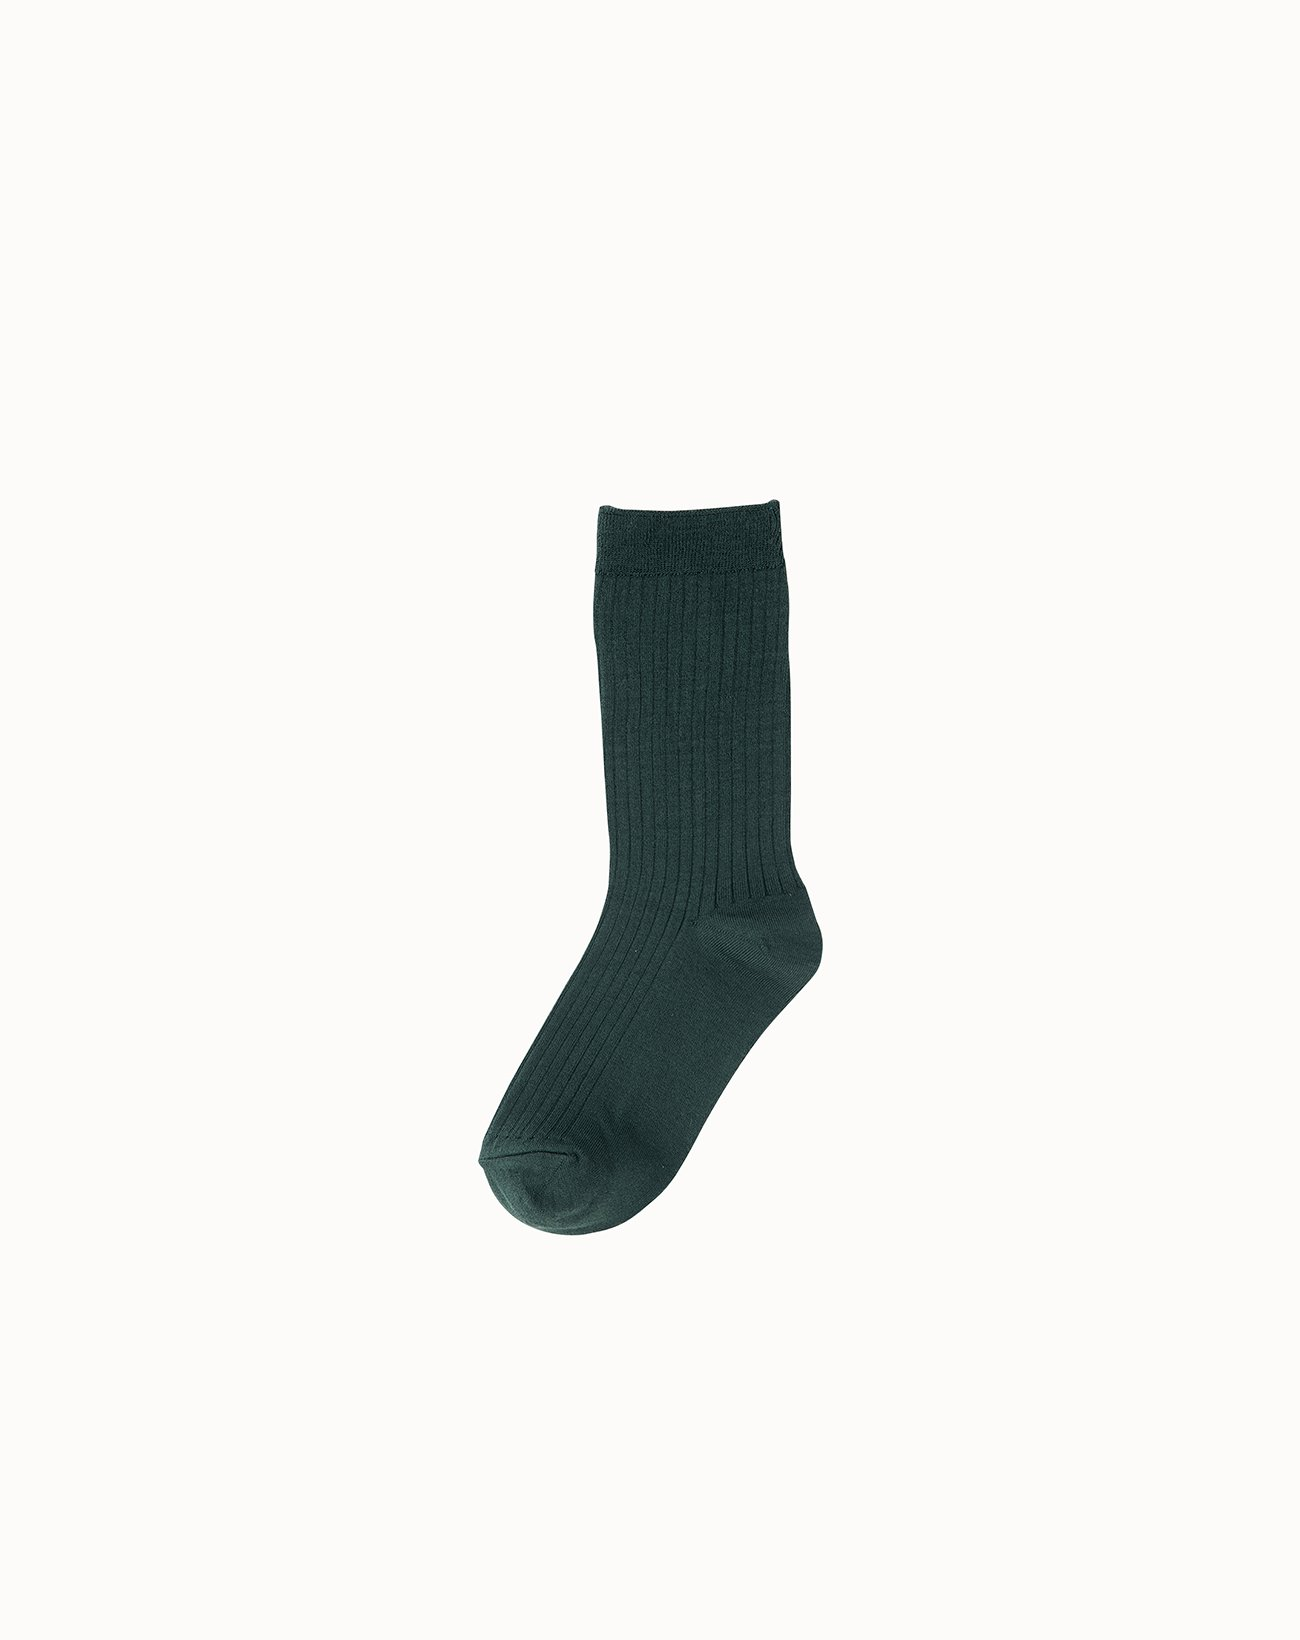 Silk Rib Socks - Green